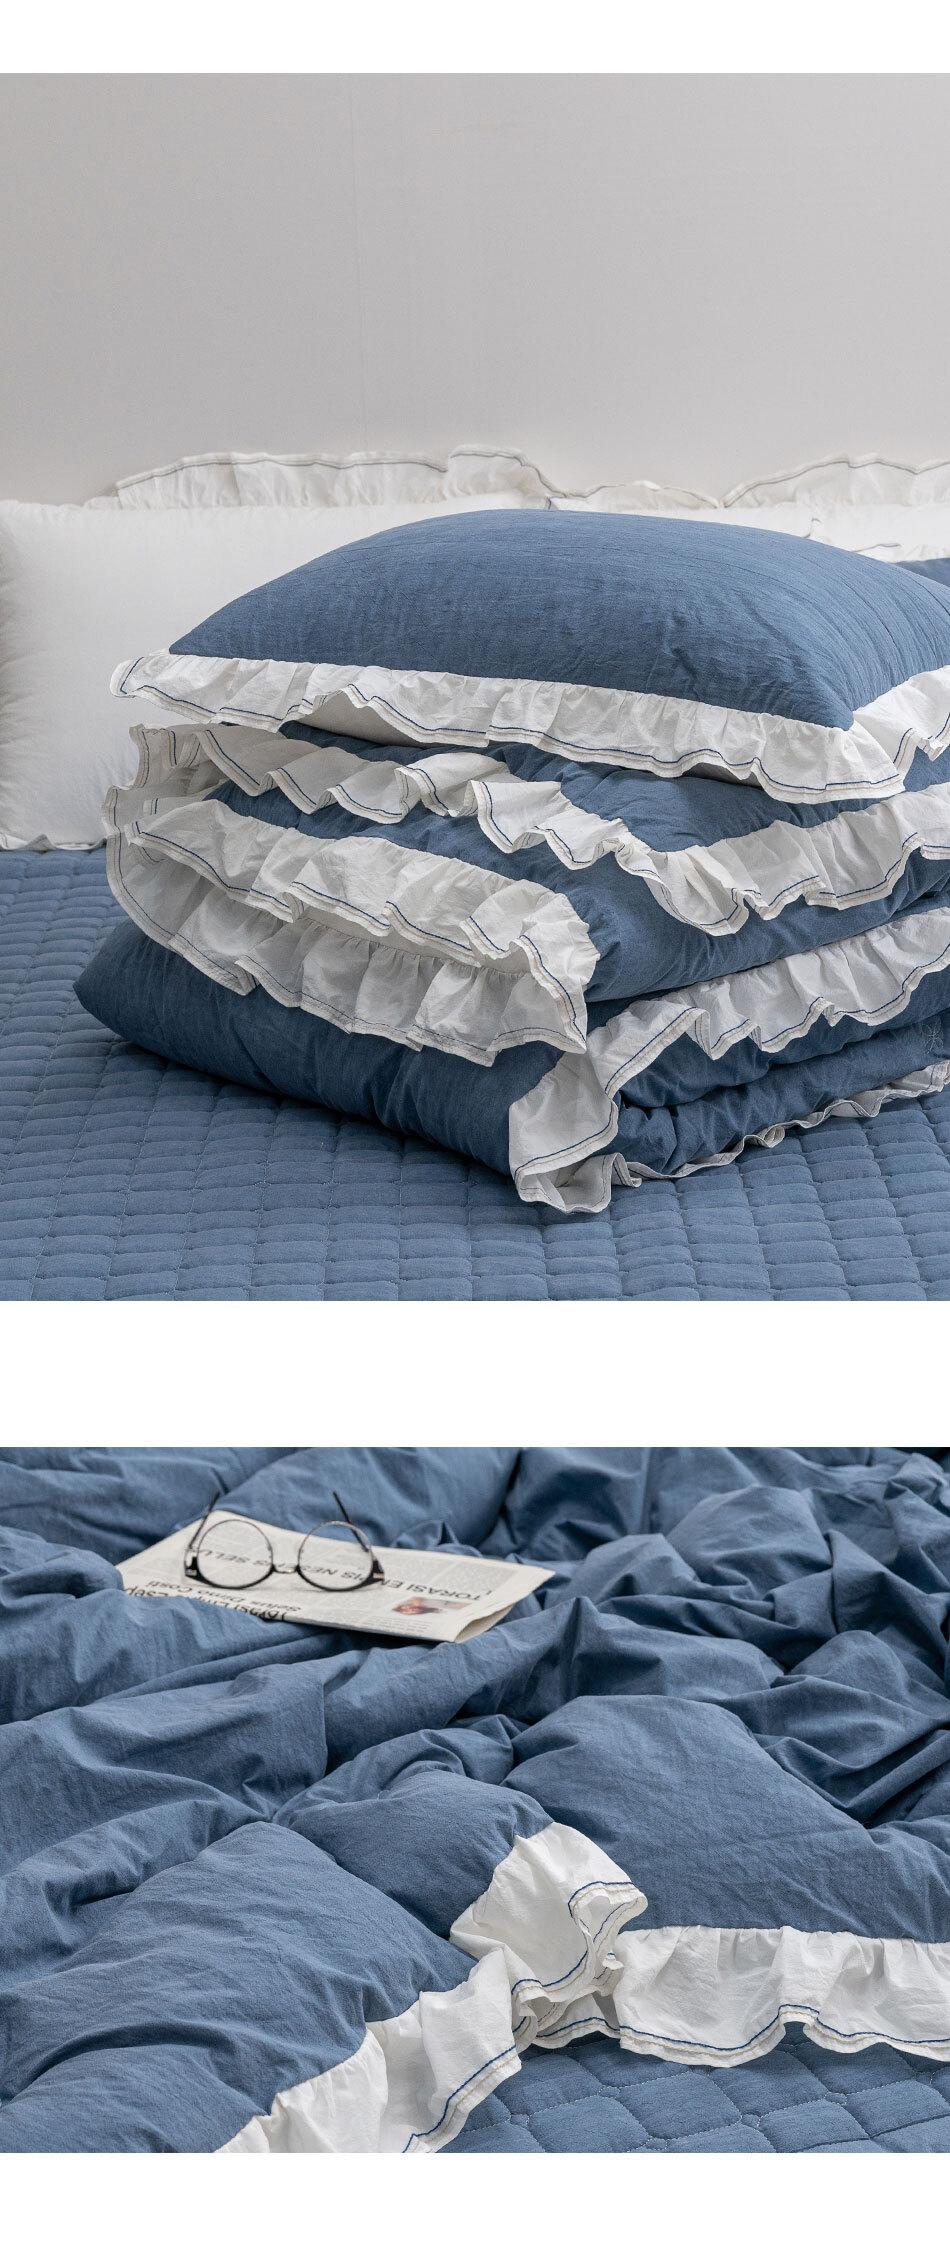 stay_bed_blue4.jpg